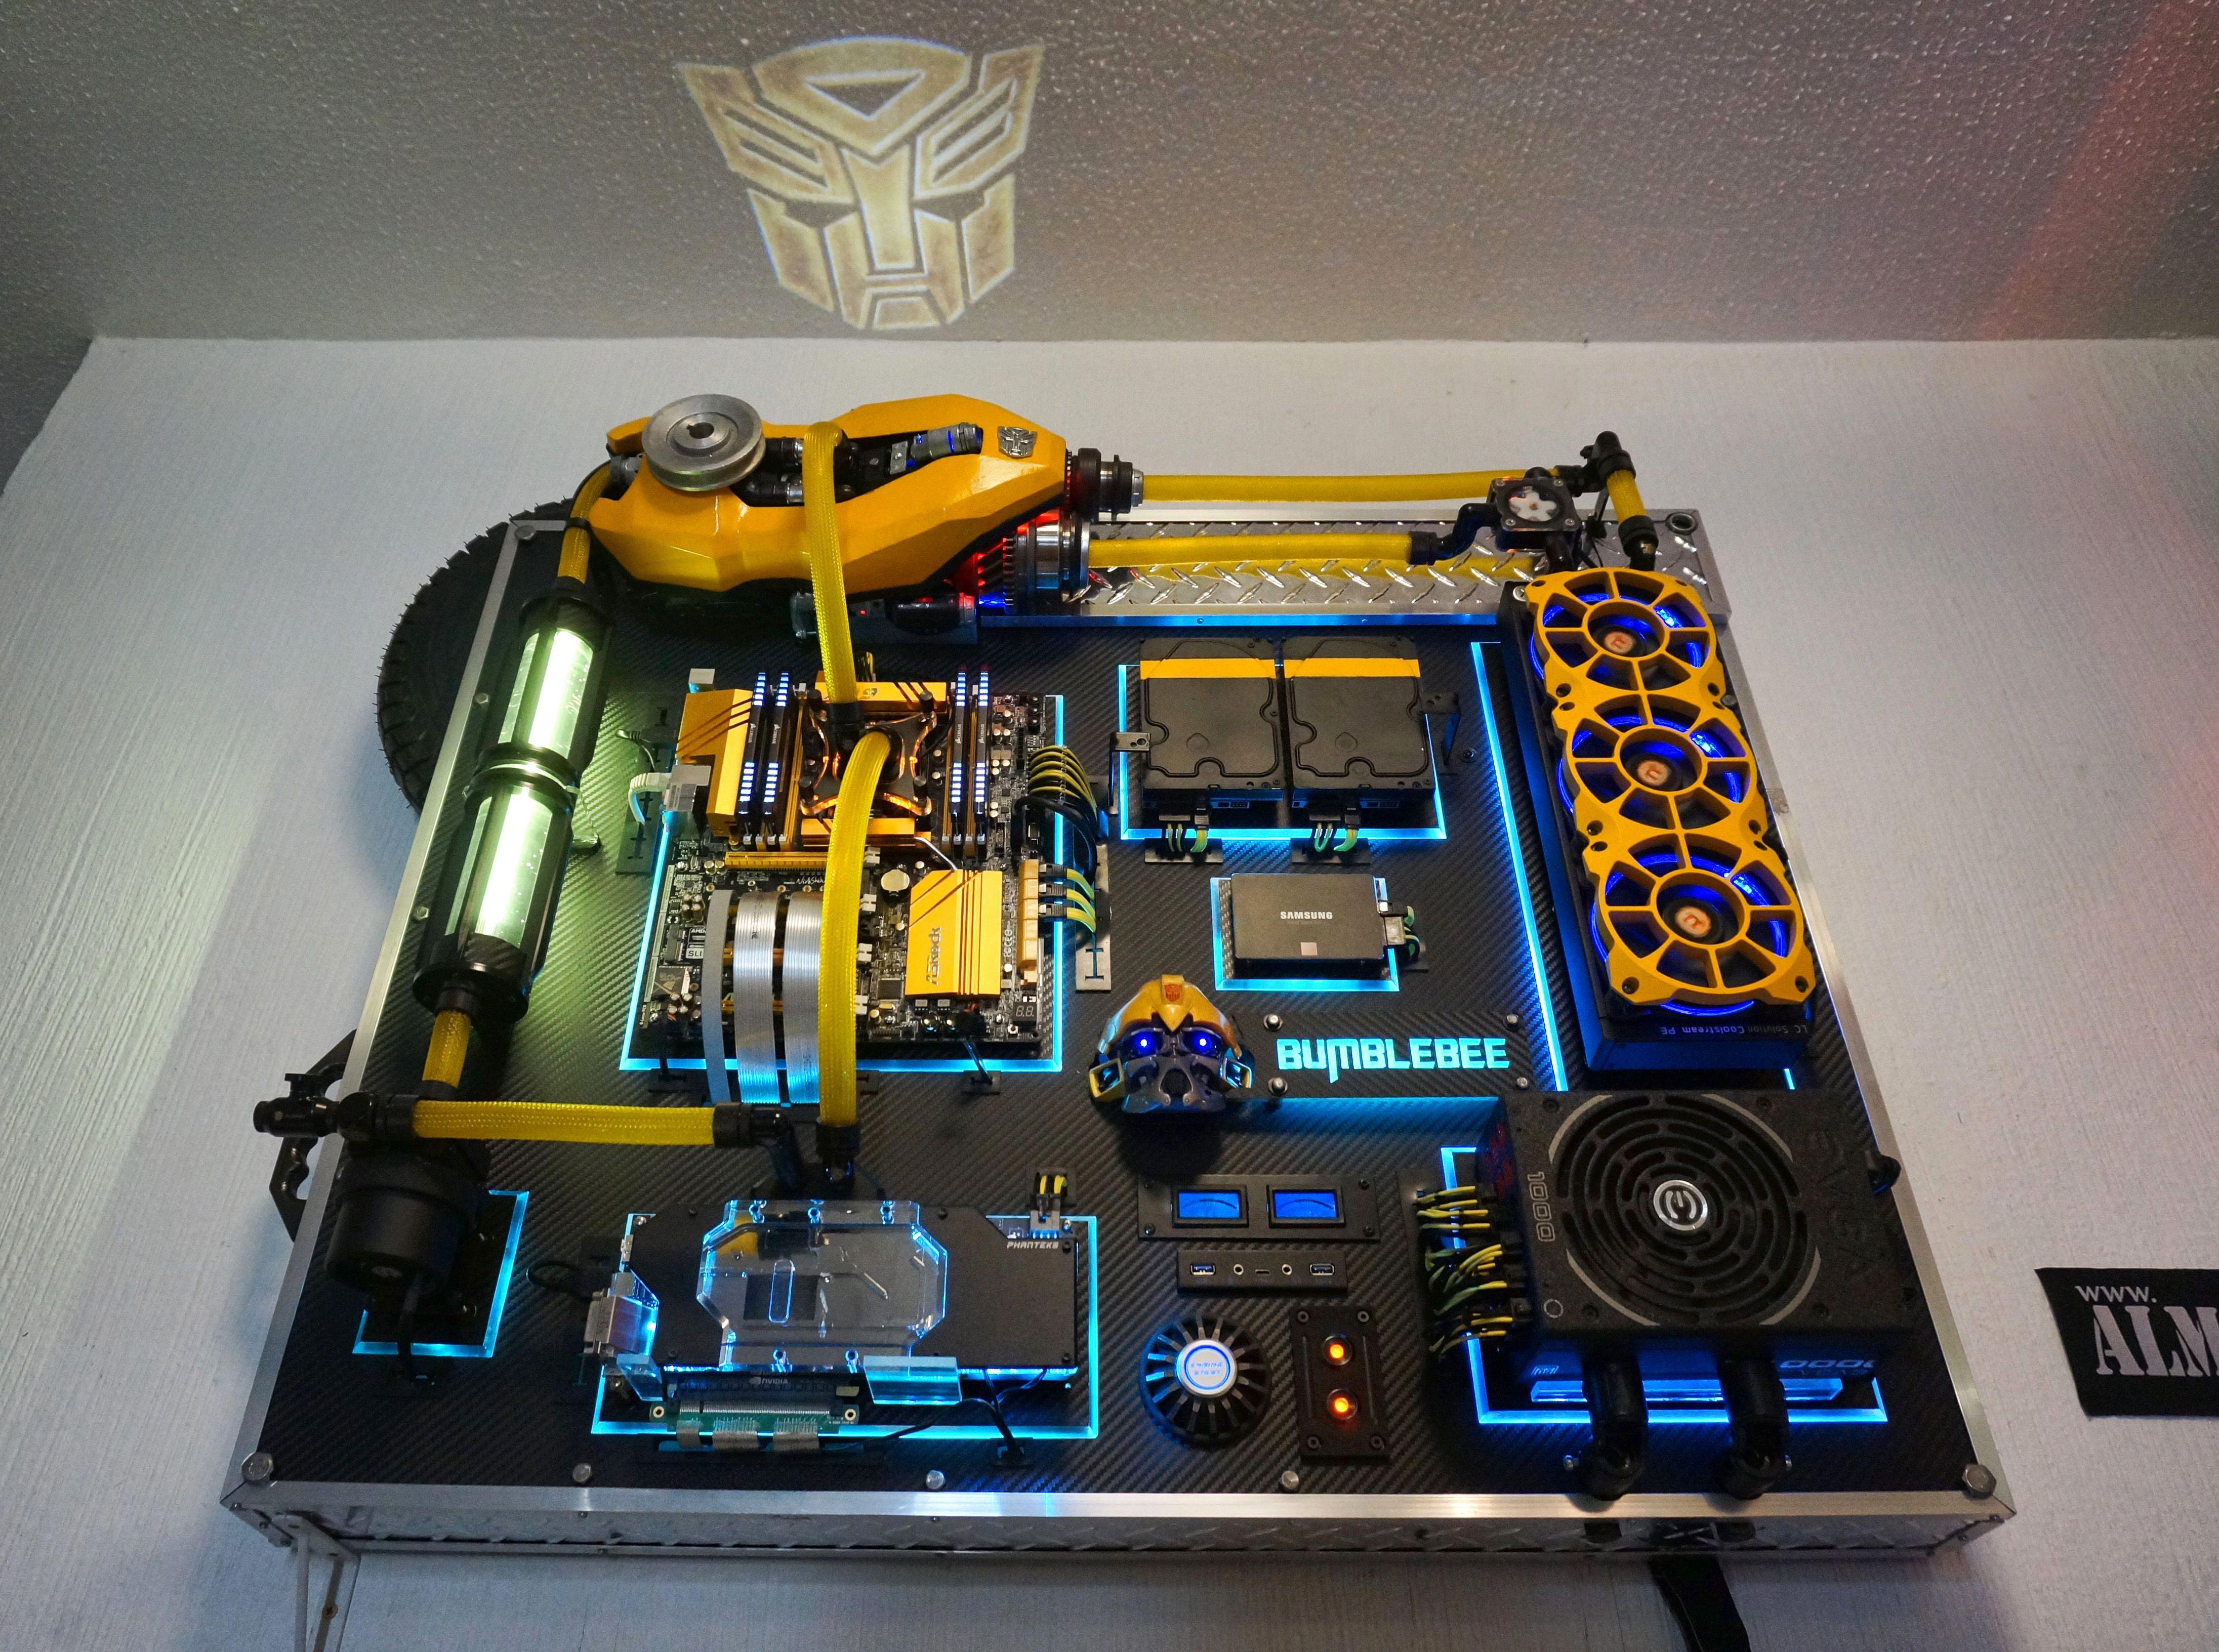 Bumbllebee Wall-Mounted Computer